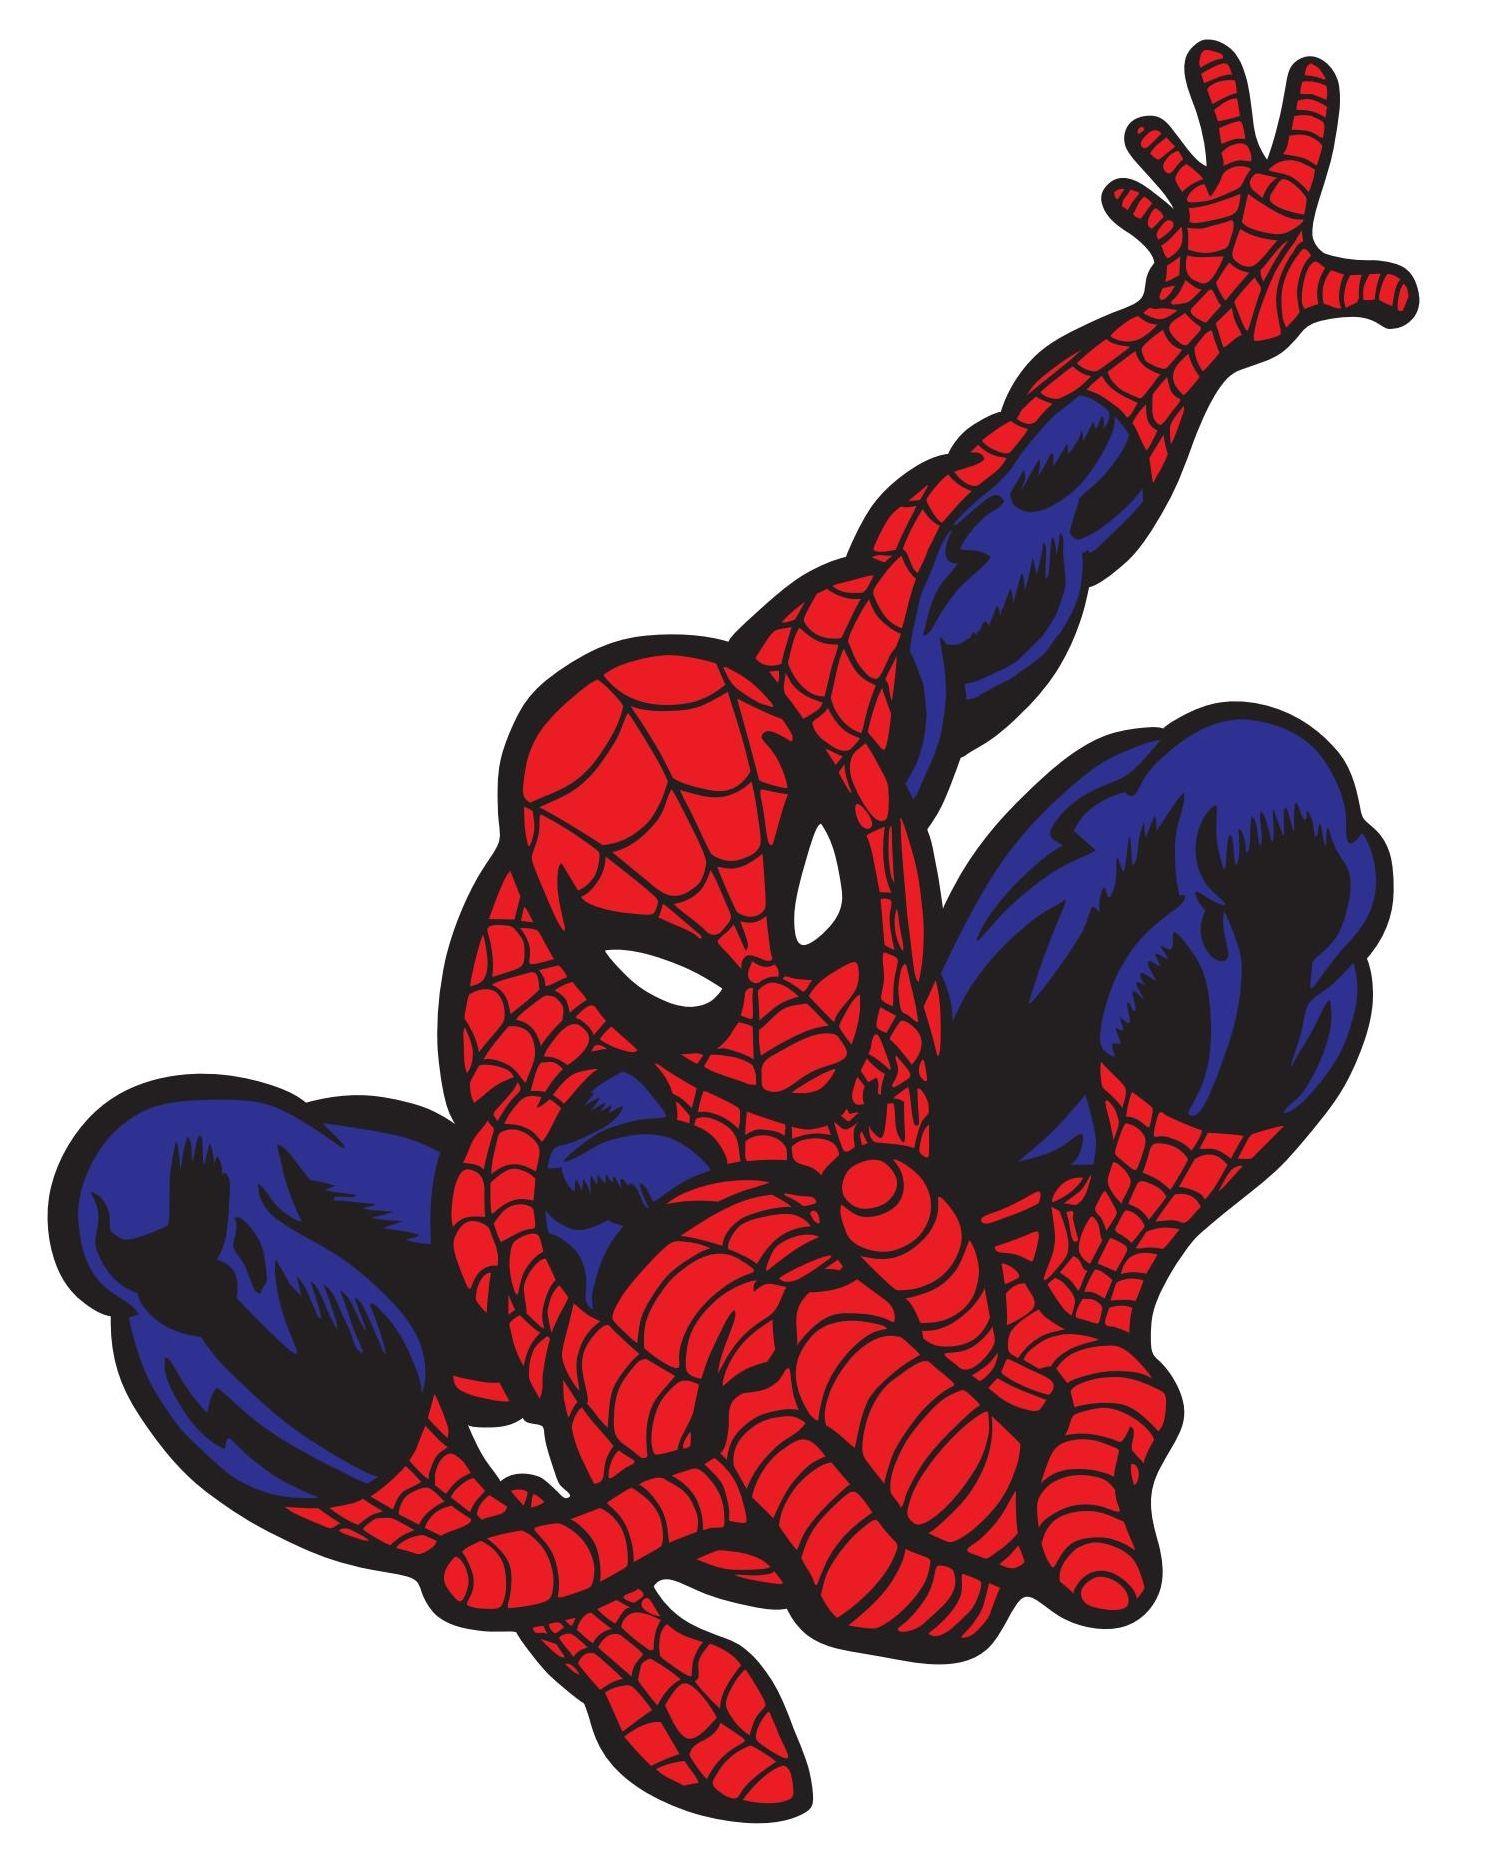 spider man logo superheroes logo pinterest spider man spider rh pinterest com Batman Logo spider man monologue